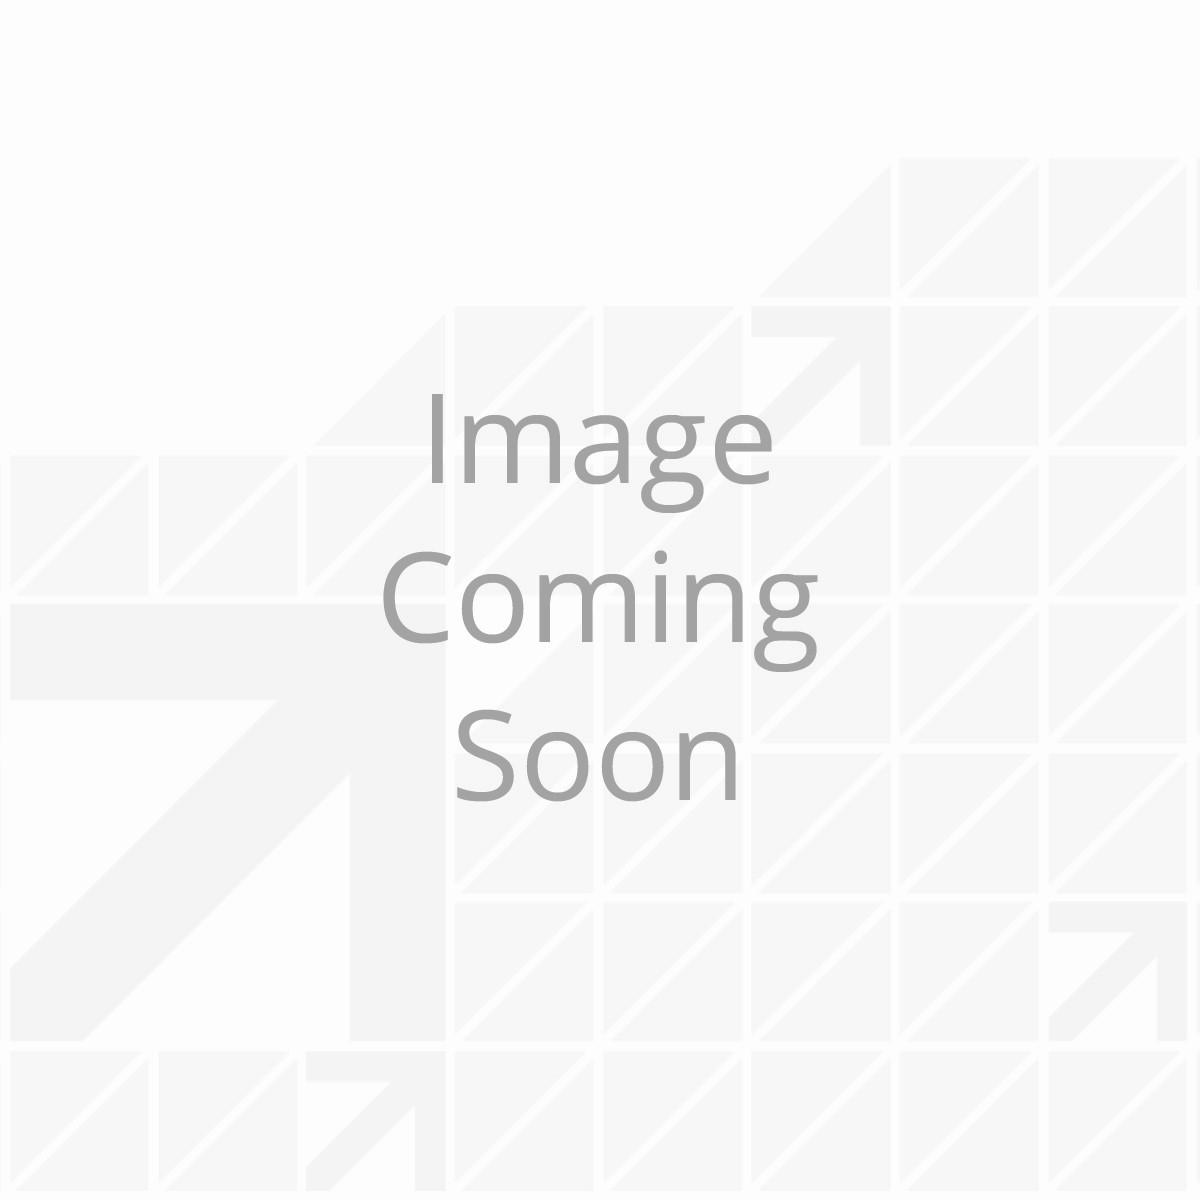 Equa-Flex® Rubberized Equalizer - Triple Axle Kit, Heavy-Duty 5,000 to 8,000 lbs.